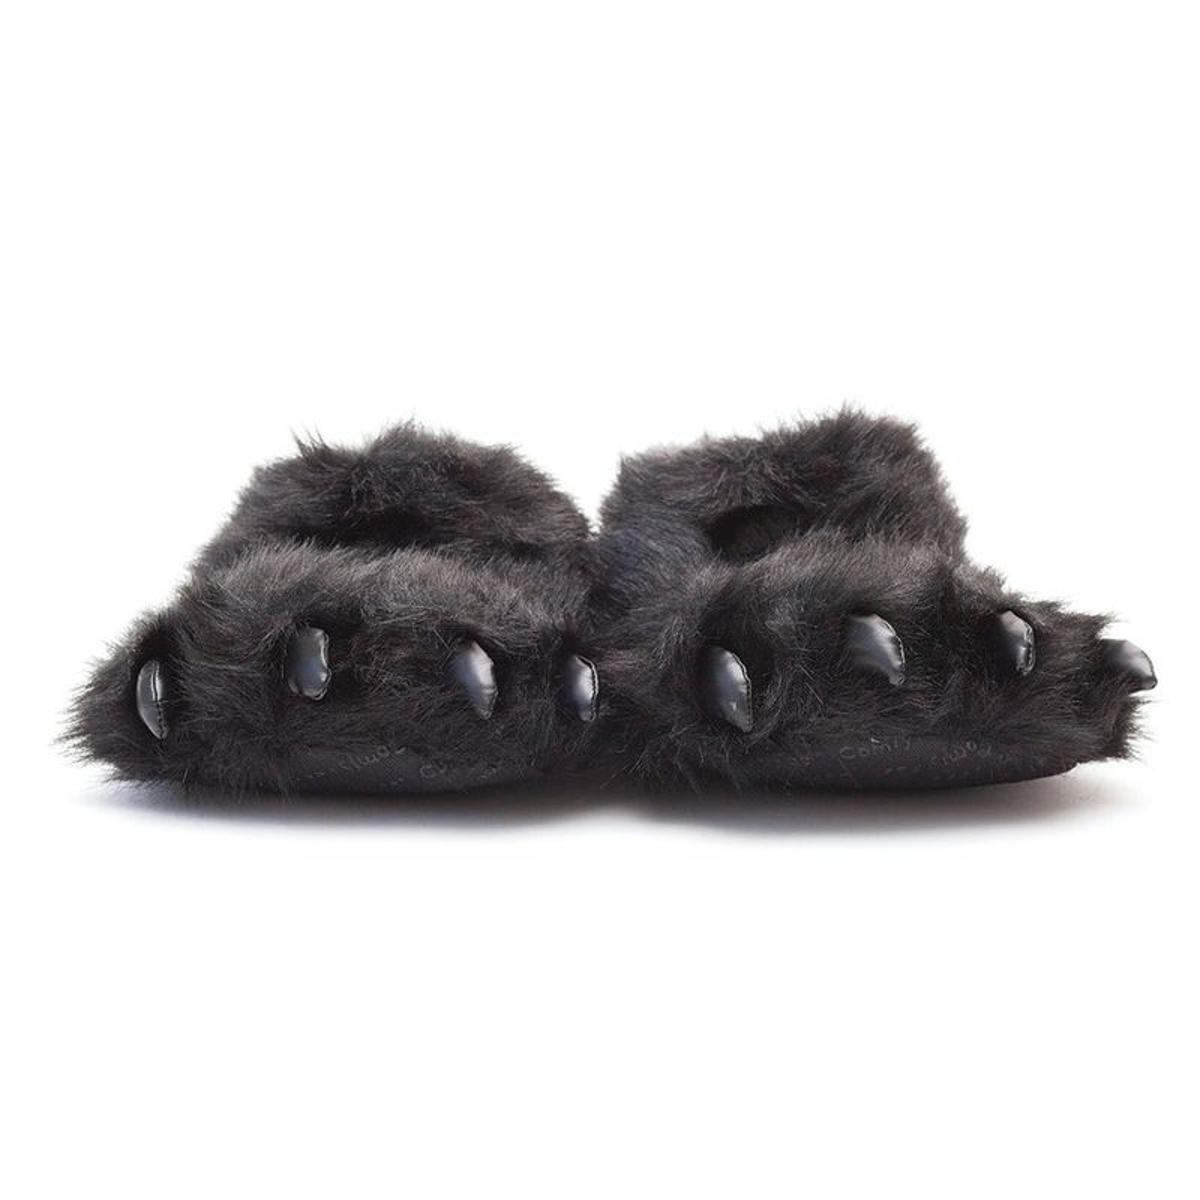 Chausson animaux griffe patte d'ours noire